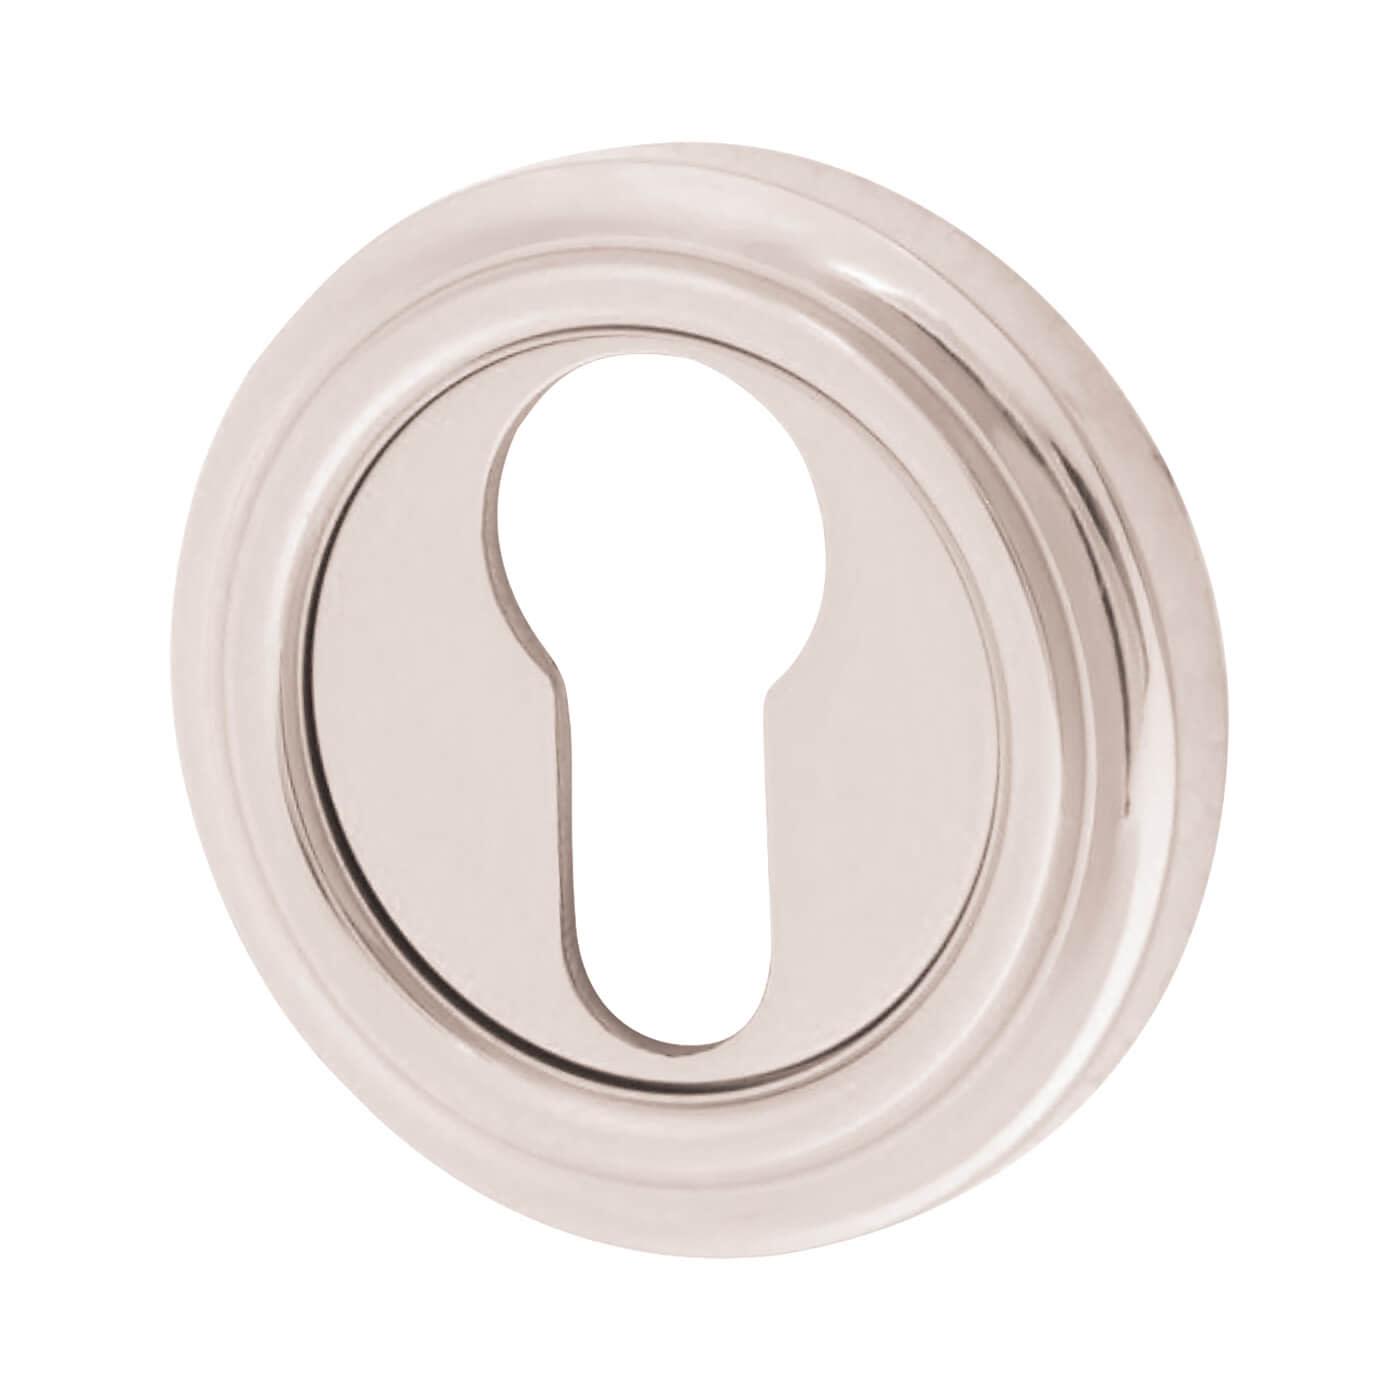 Euro Escutcheon - Polished Nickel)